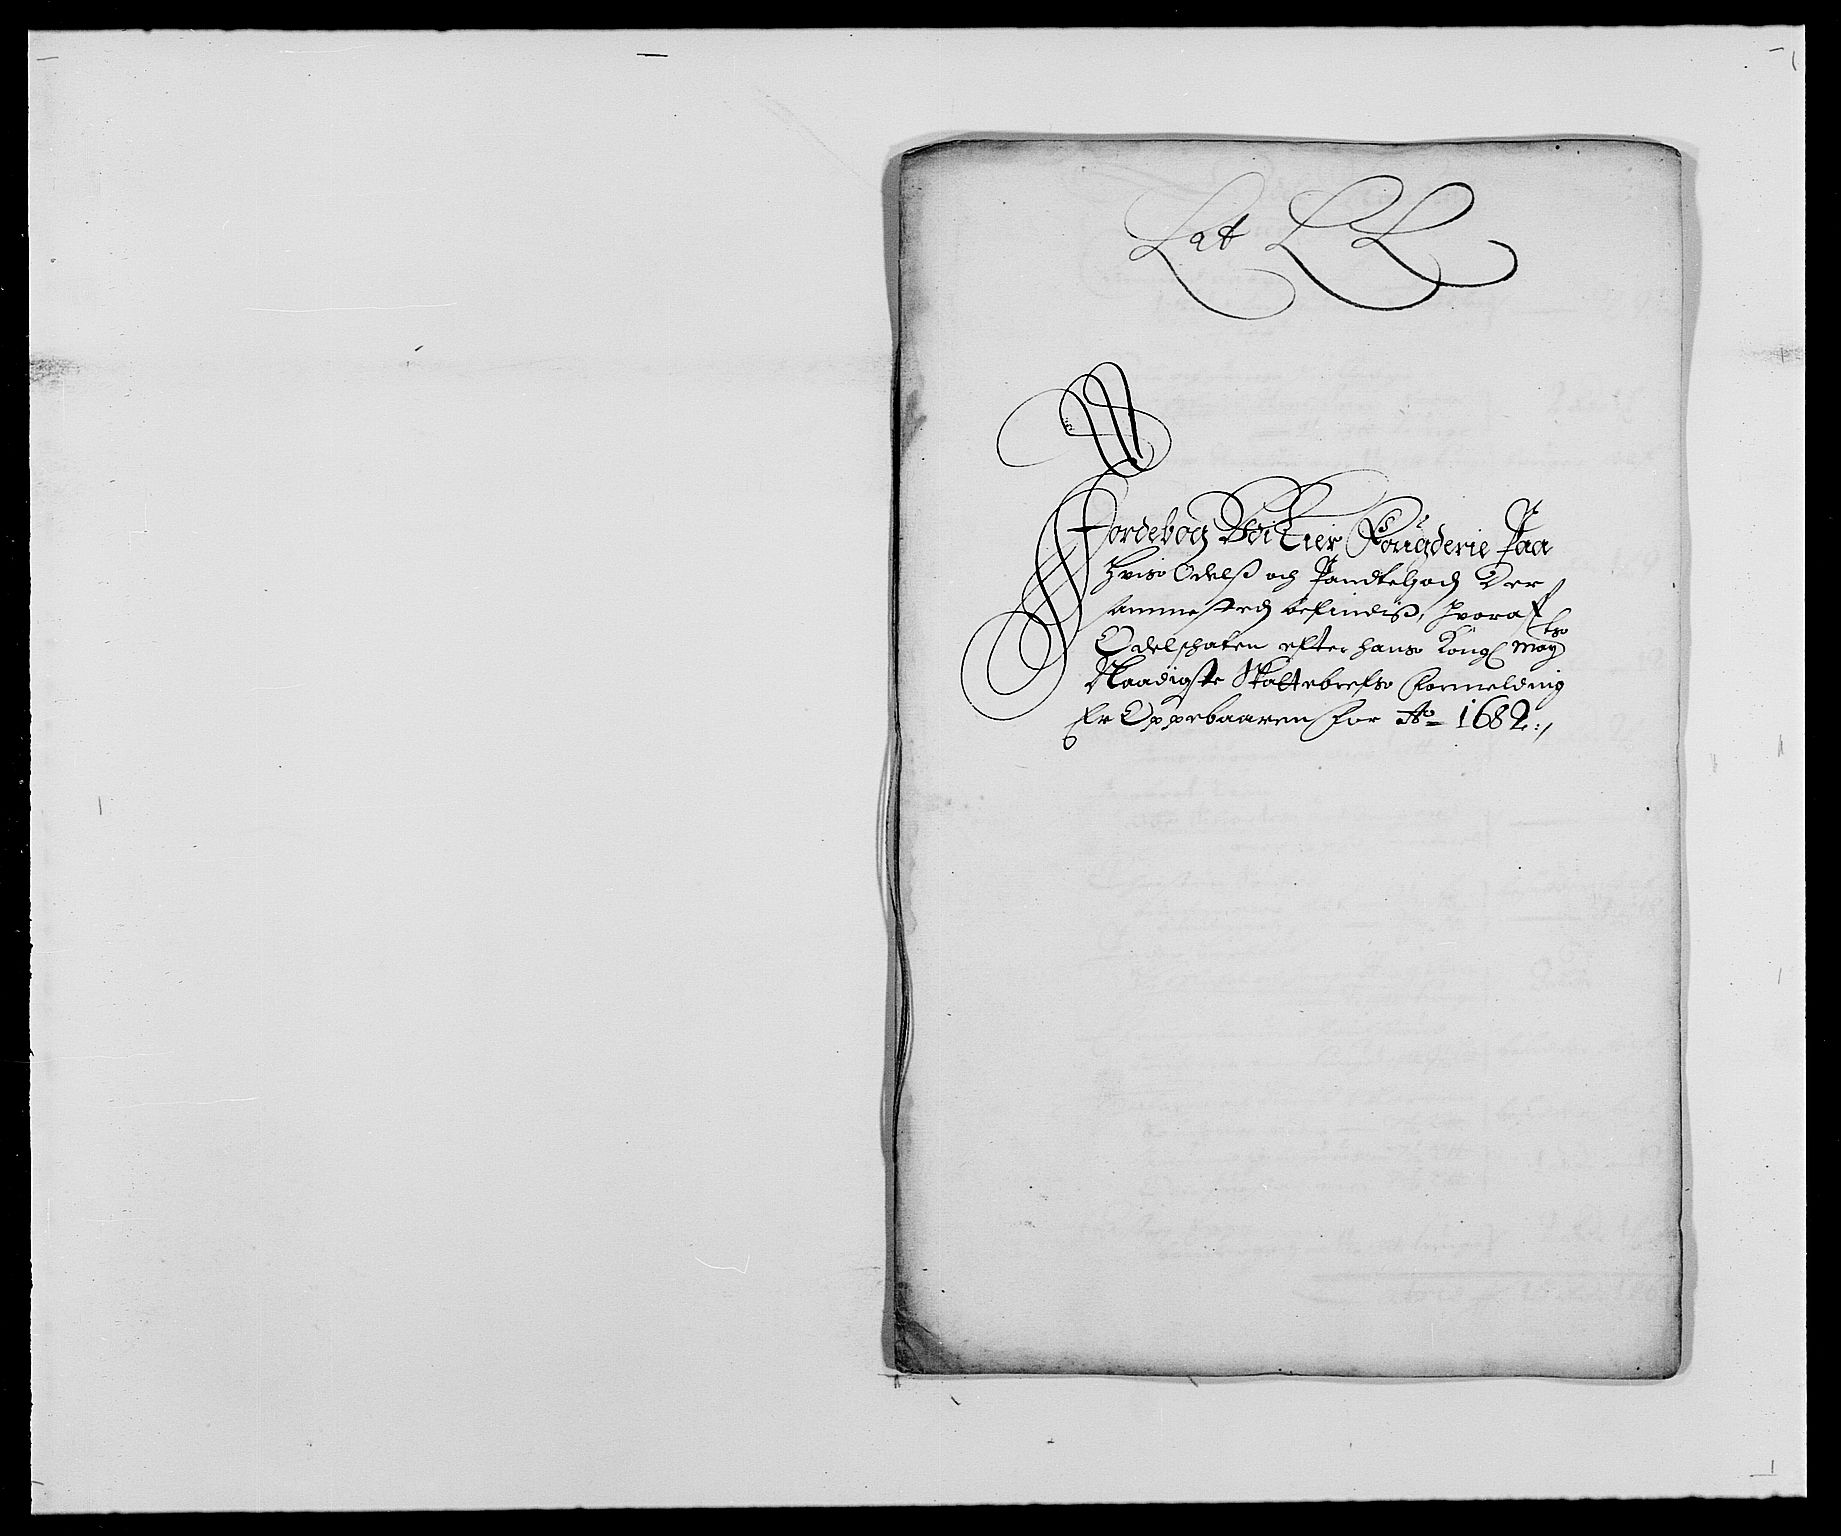 RA, Rentekammeret inntil 1814, Reviderte regnskaper, Fogderegnskap, R27/L1686: Fogderegnskap Lier, 1678-1686, s. 406